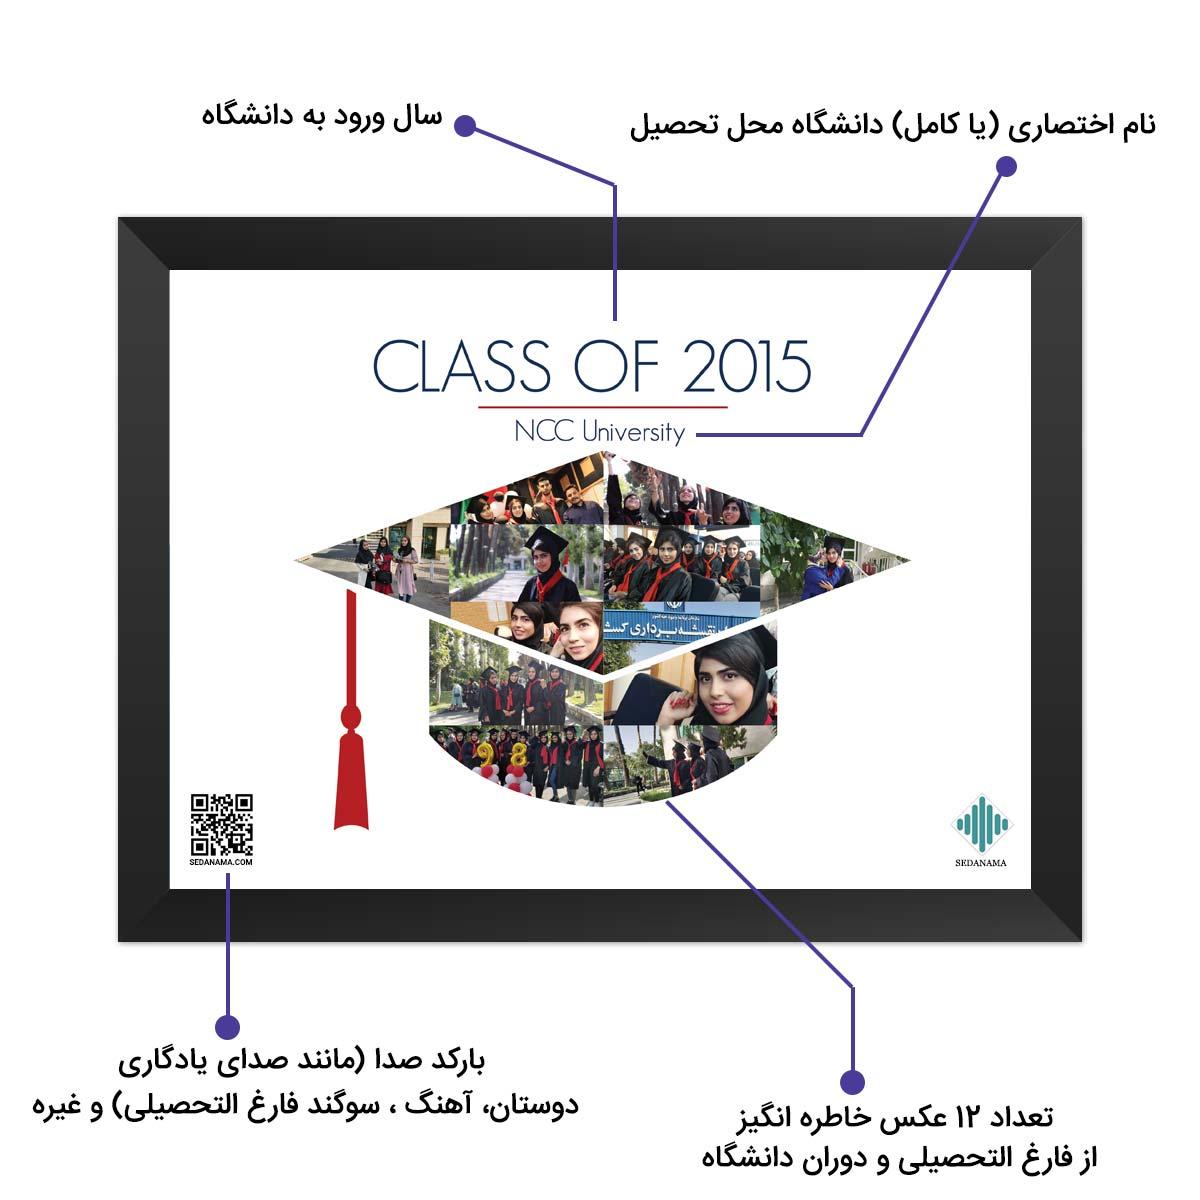 Graduation collage sdnm preview guide - راهنمای خرید هدیه فارغ التحصیلی: 1+12 ایده برای خرید هدیه